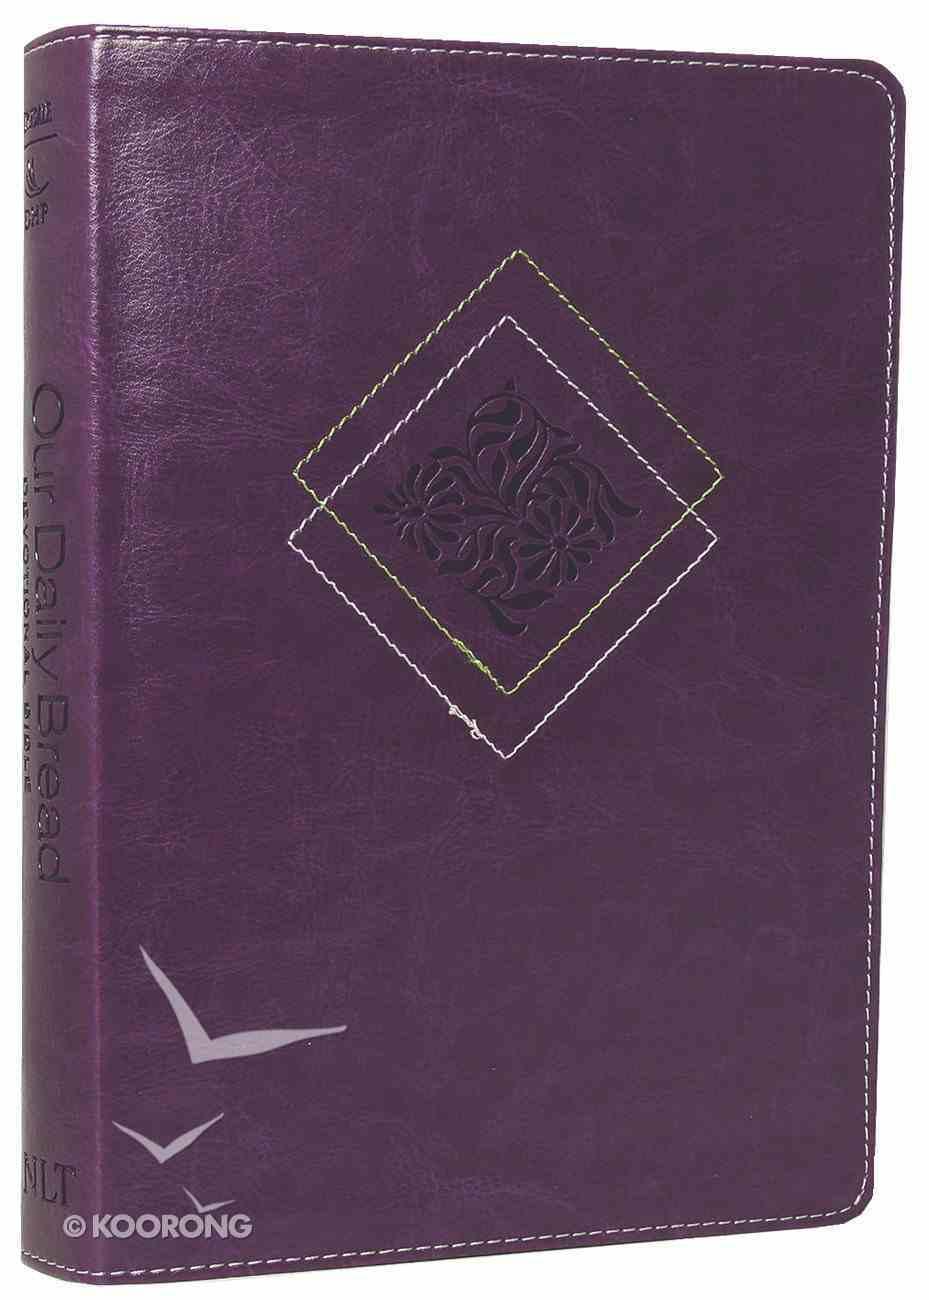 NLT Our Daily Bread Devotional Bible Eggplant (Black Letter Edition) Imitation Leather